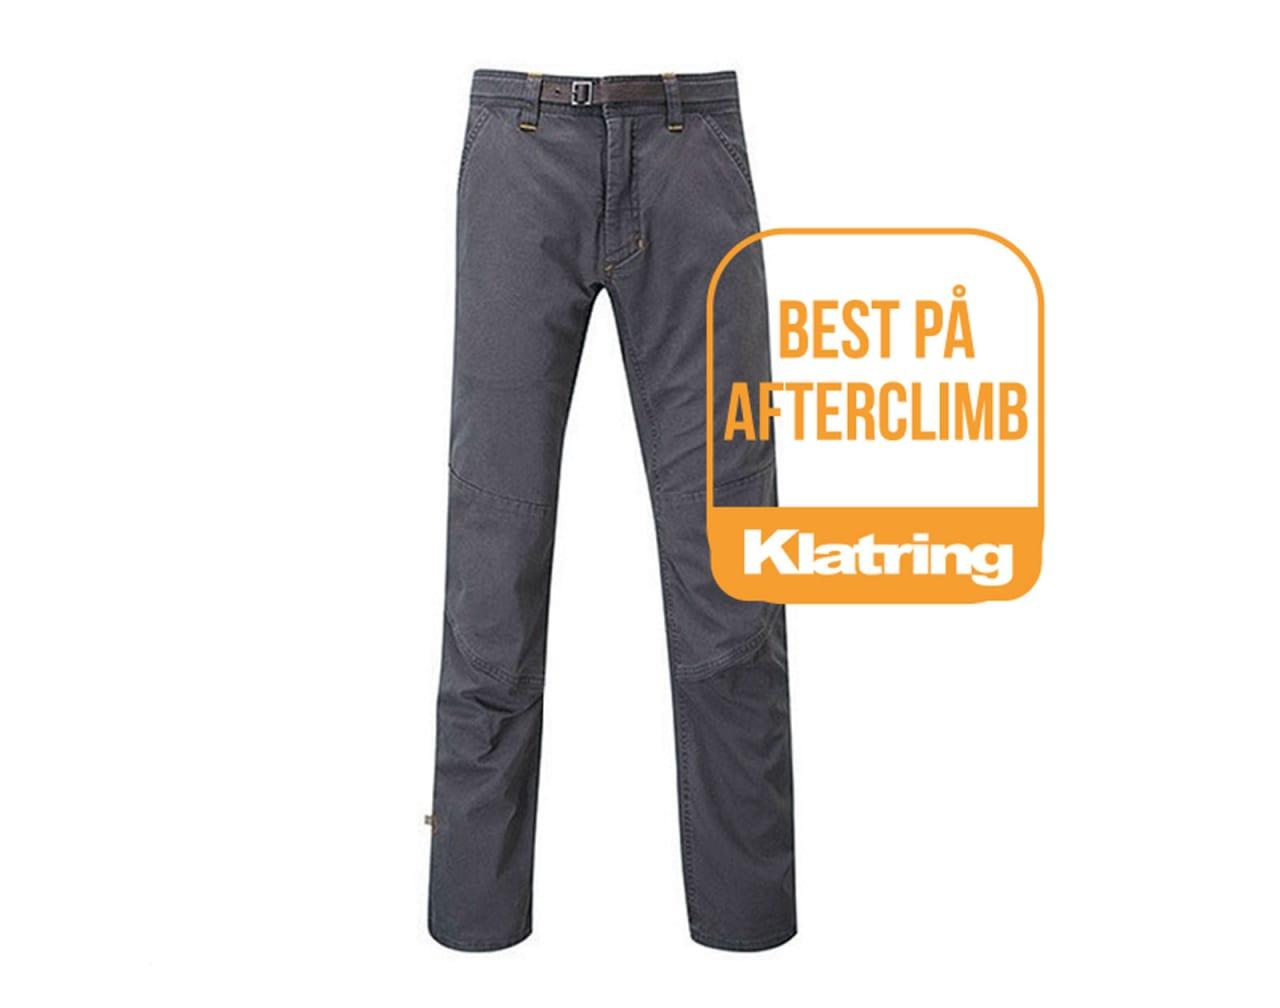 Rab Grit pants